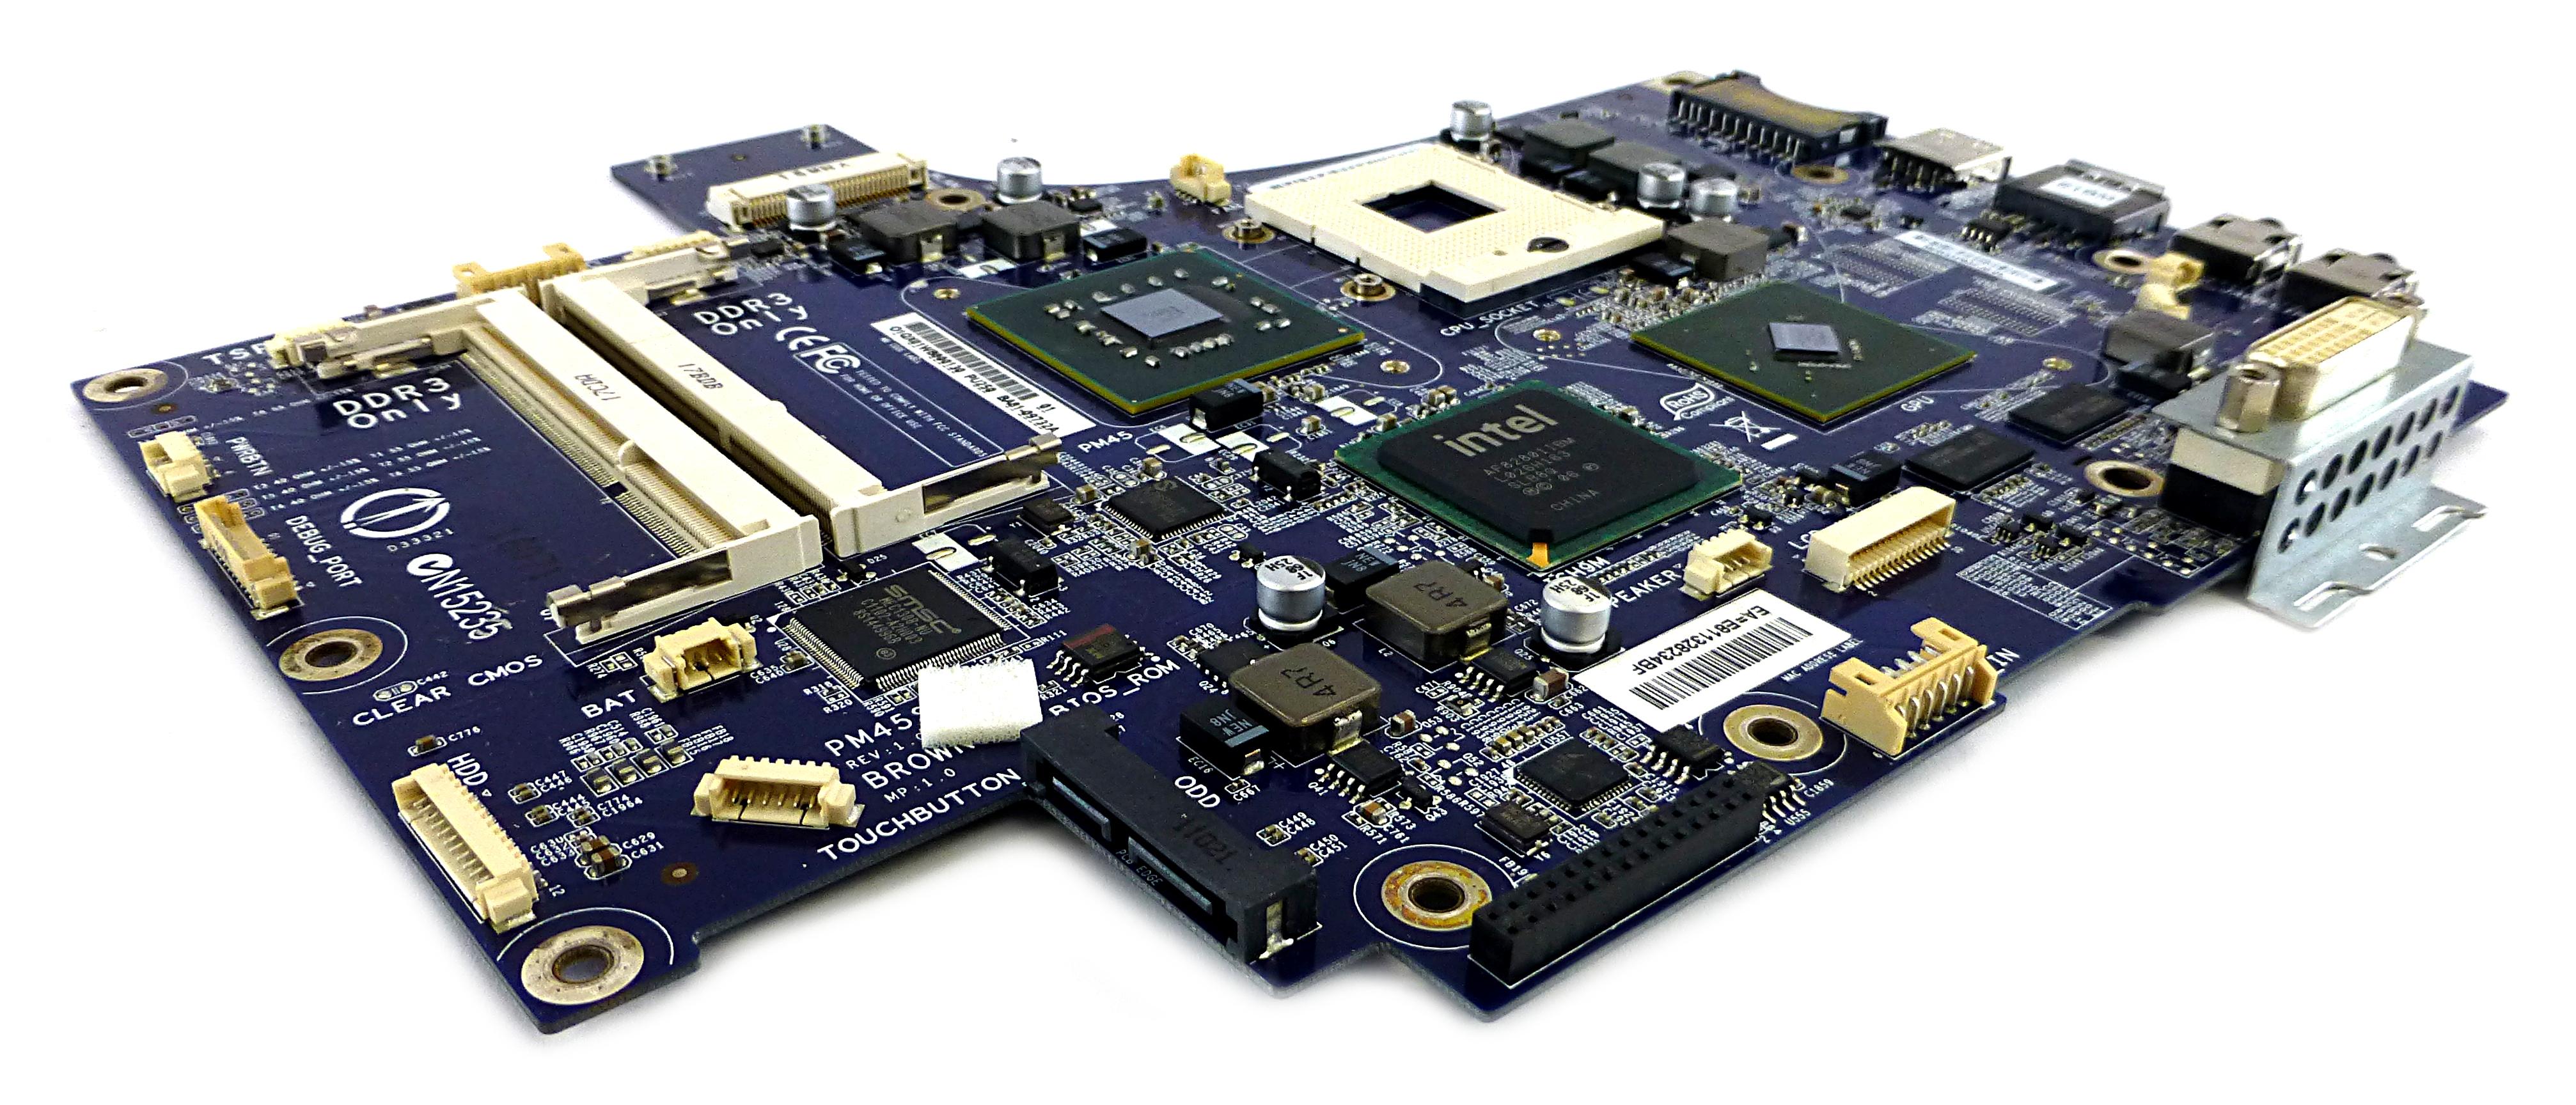 Samsung DP-U200 / DP-U250 AiO System Motherboard BA81-09732A/PM45S01S1-UK